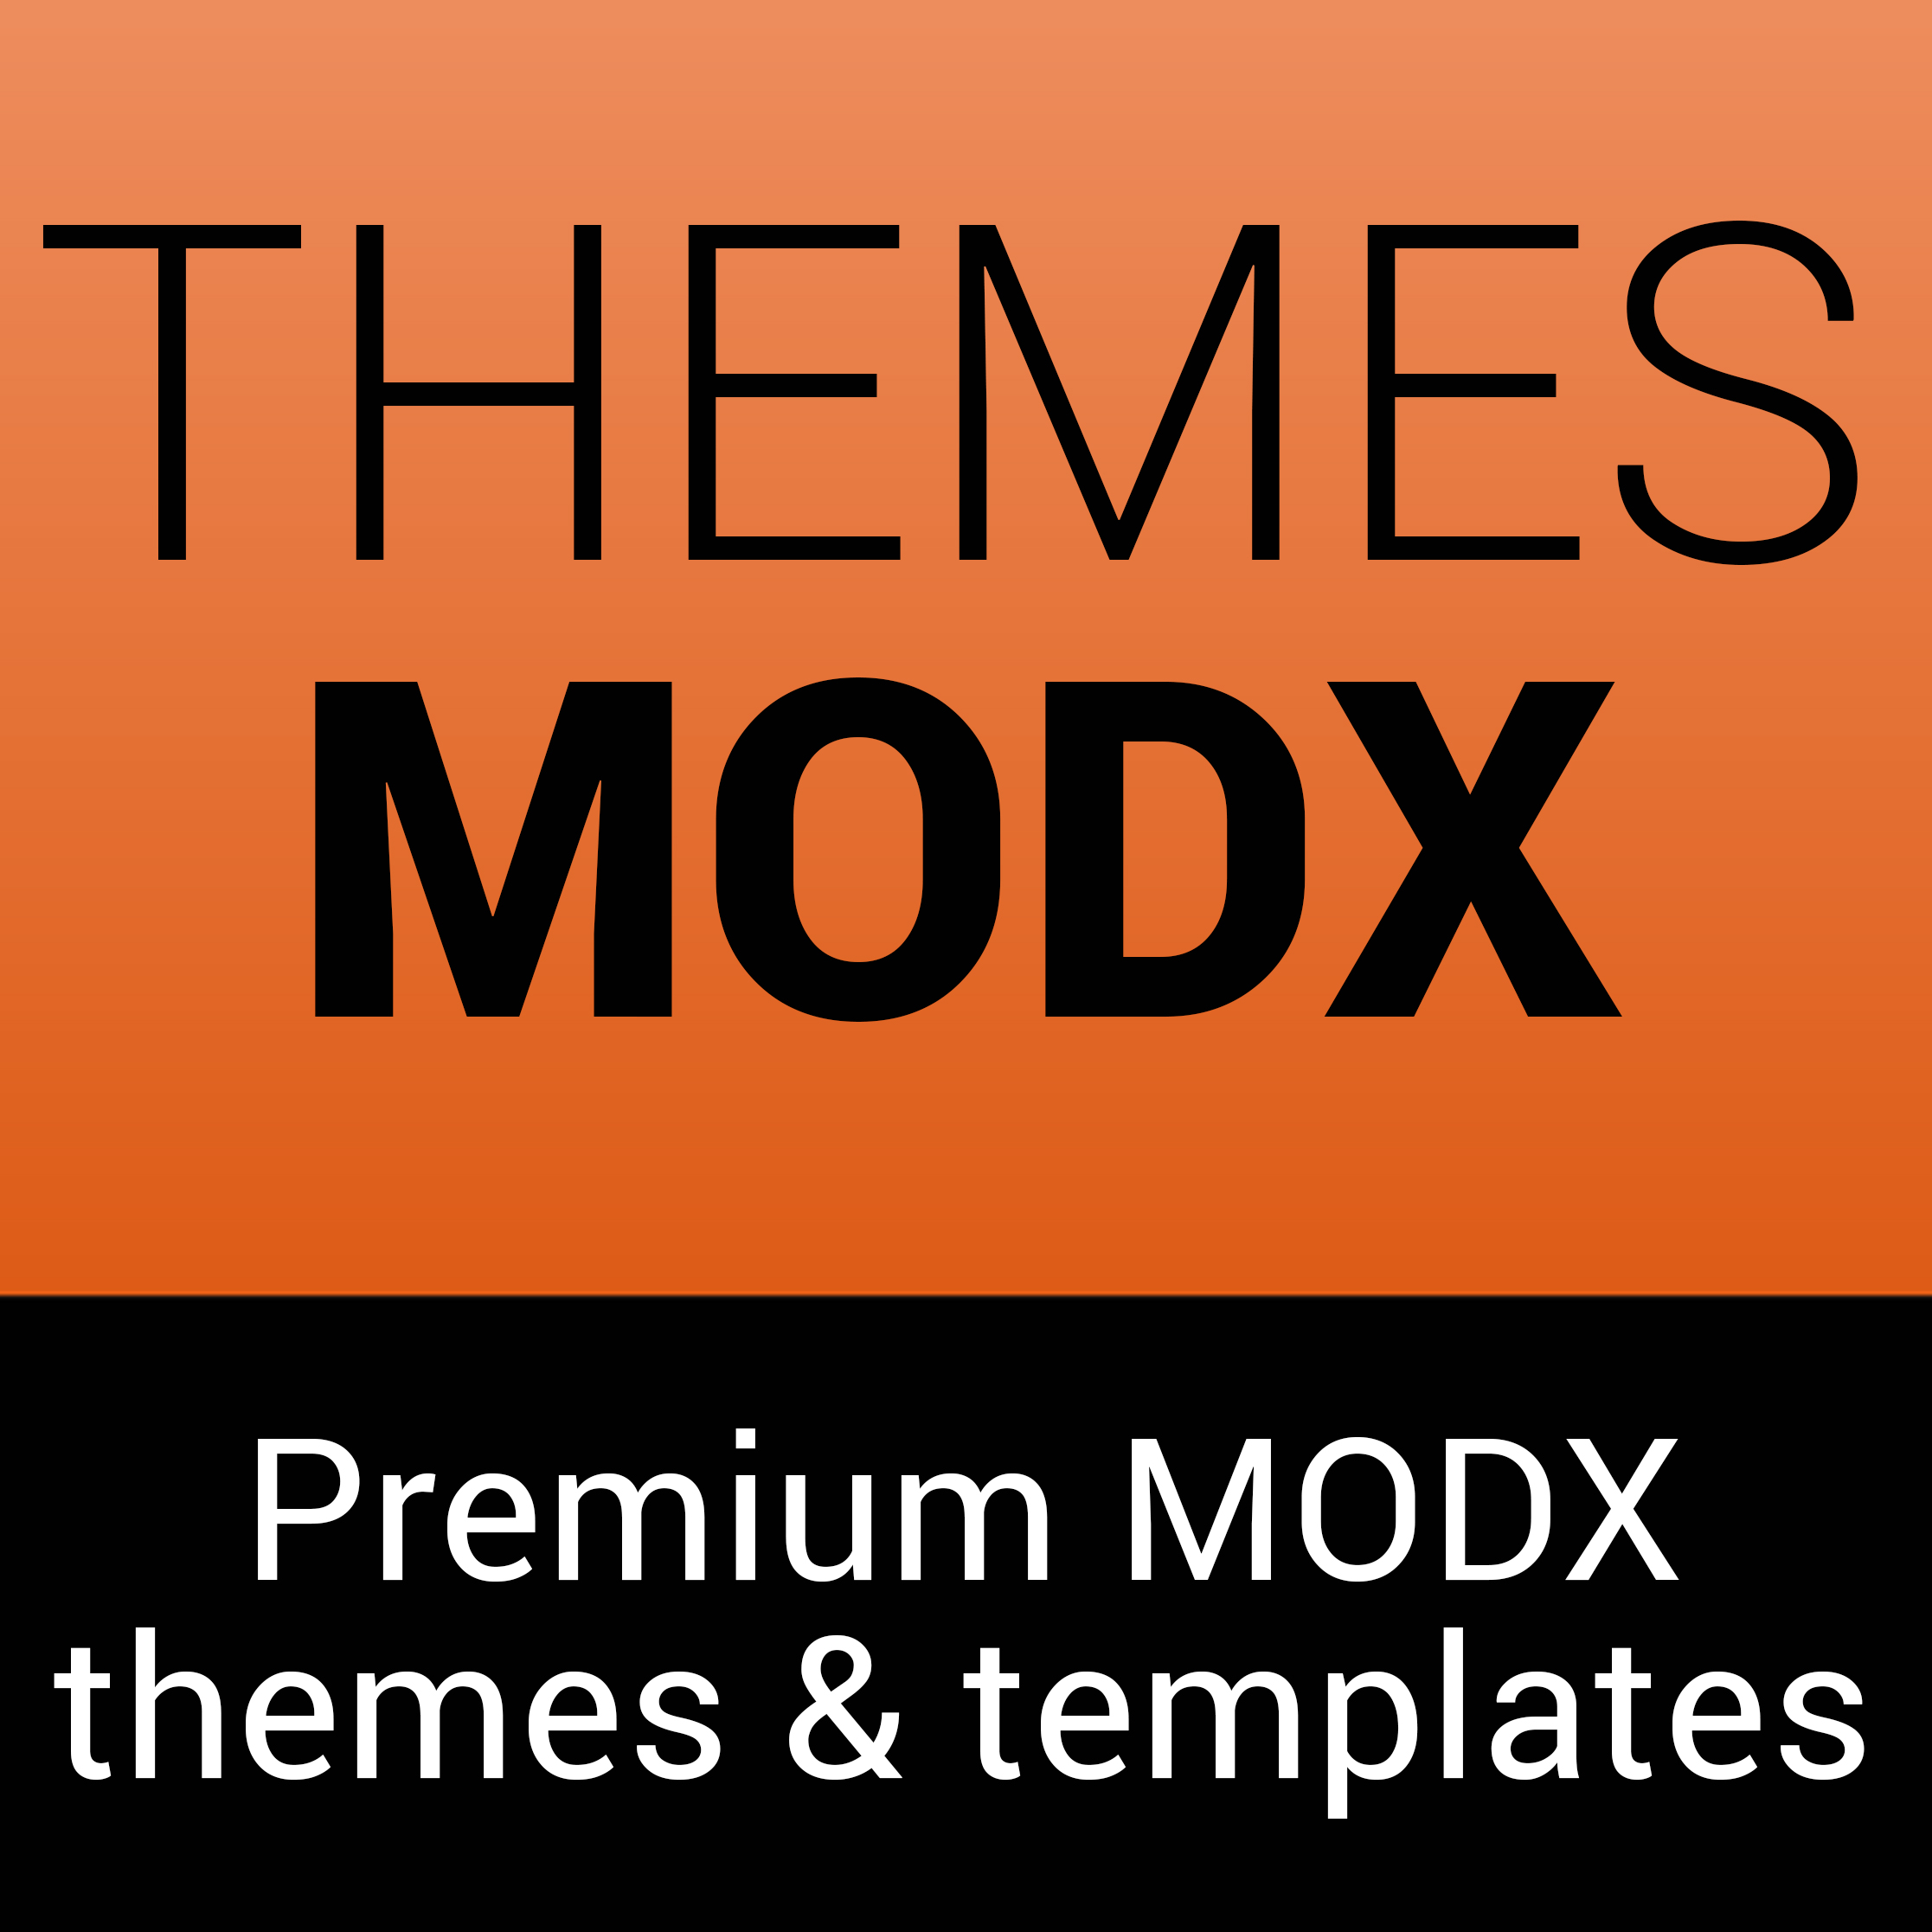 ThemesMODX